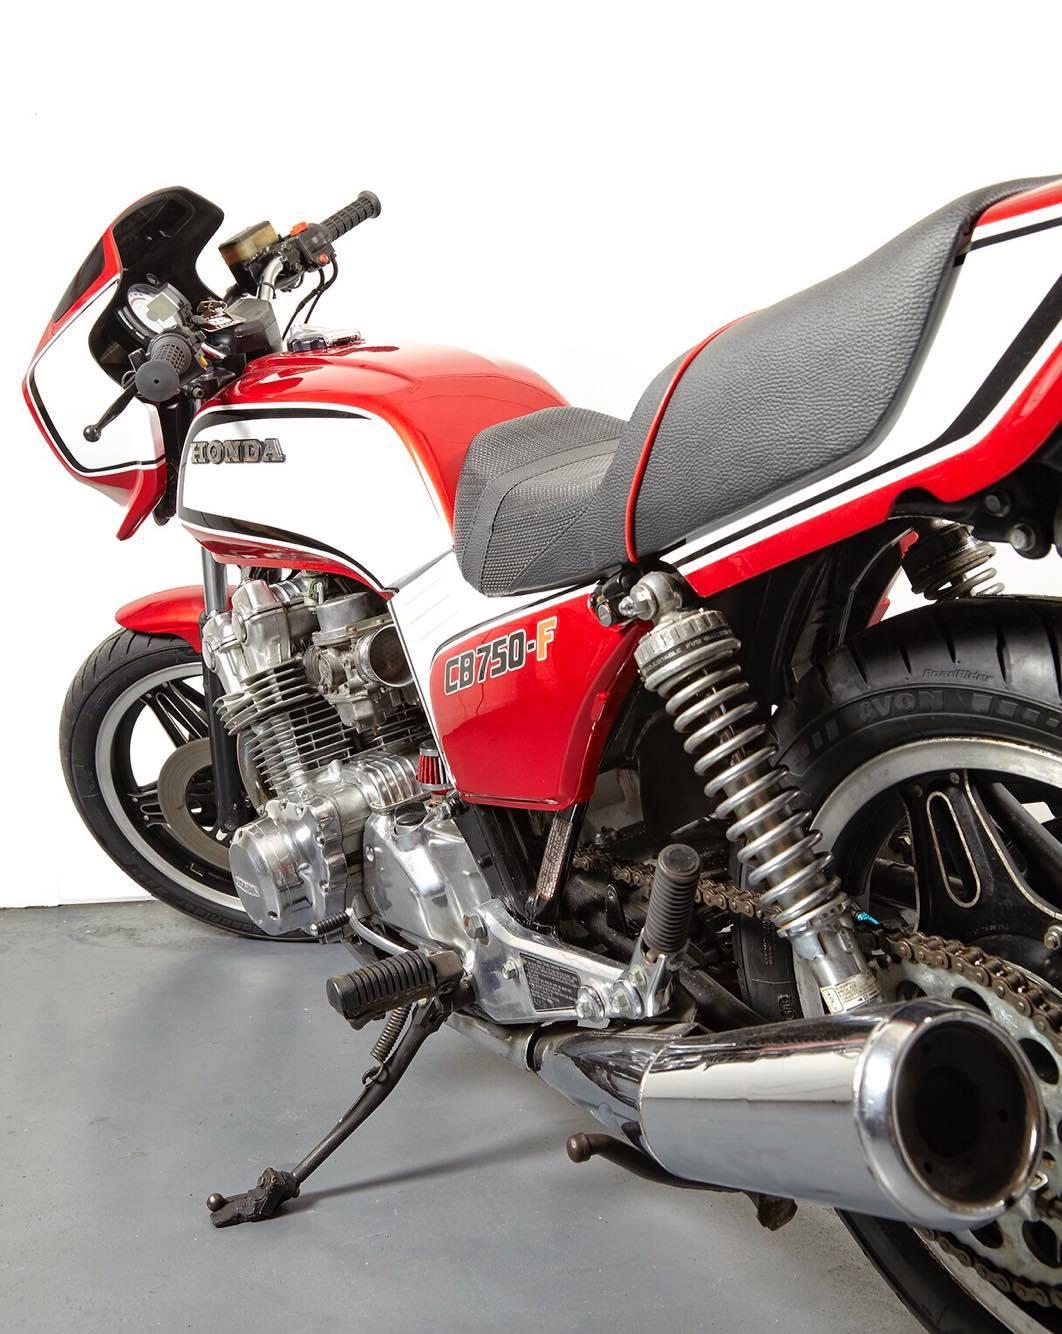 Honda Cb750f Street Racer By Vintage Iron Club Bikebound 1975